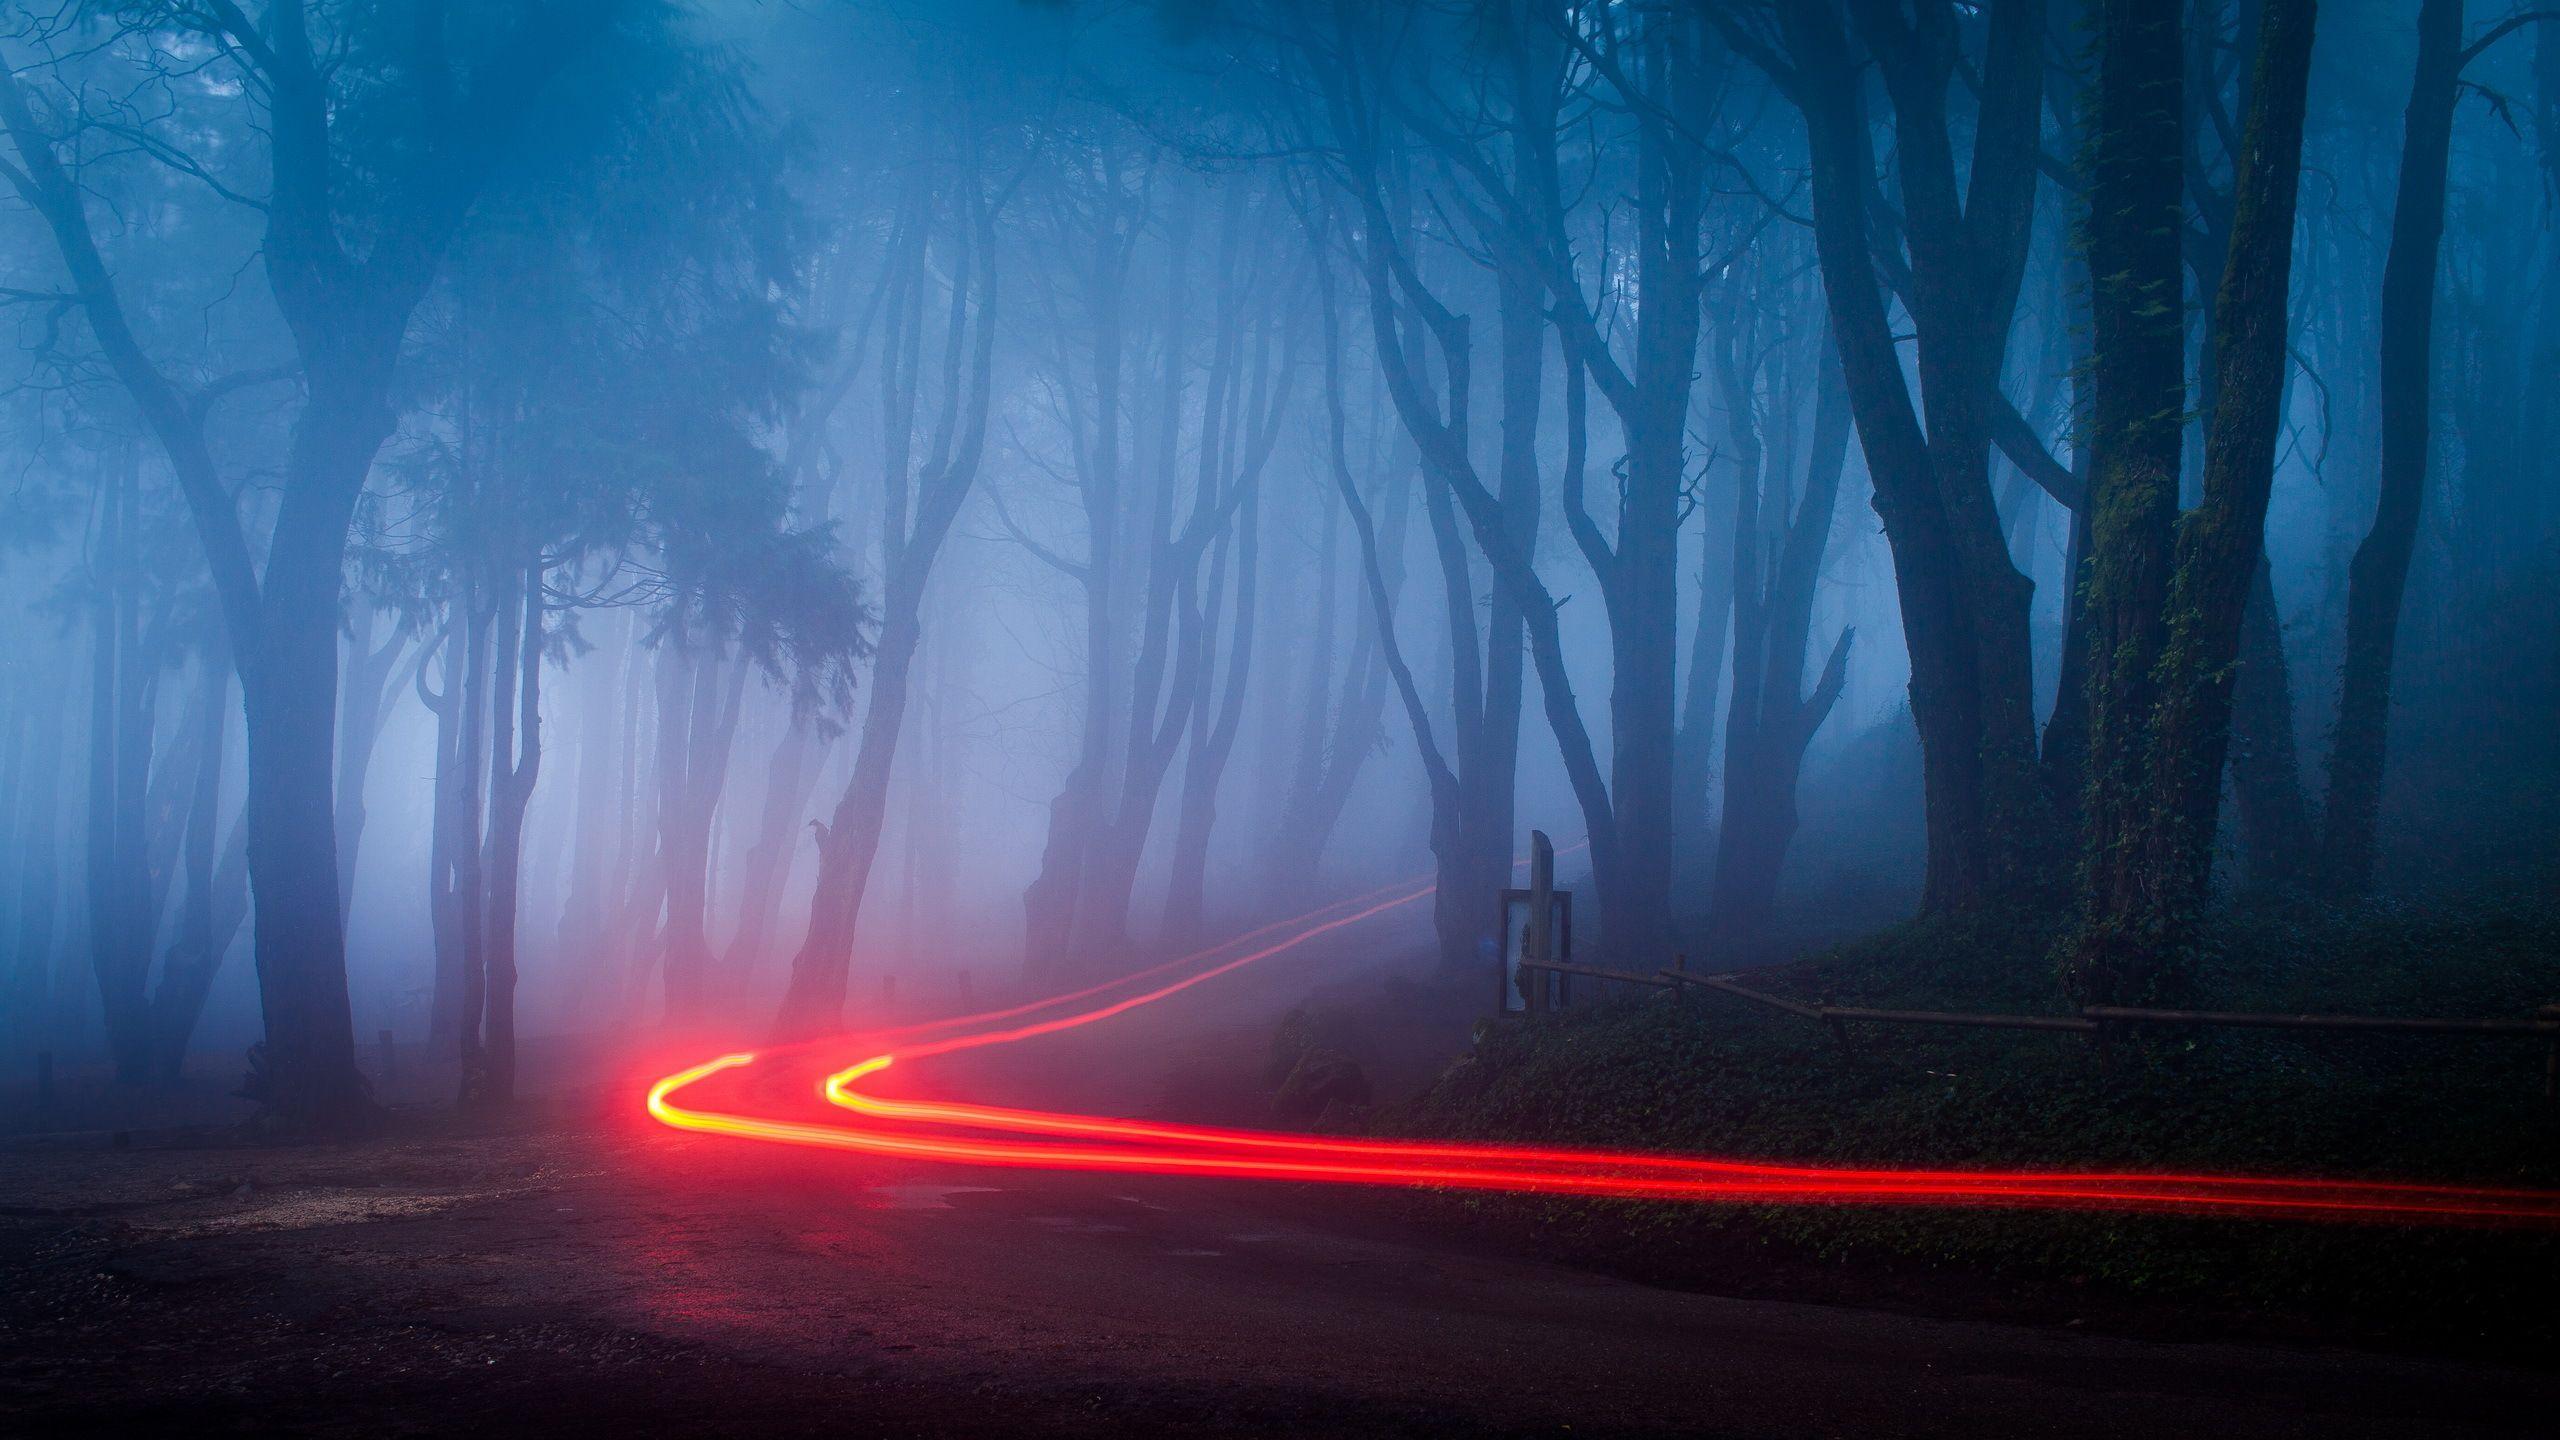 Foggy Ultra HD Landscape Wallpapers - Top Free Foggy Ultra ...